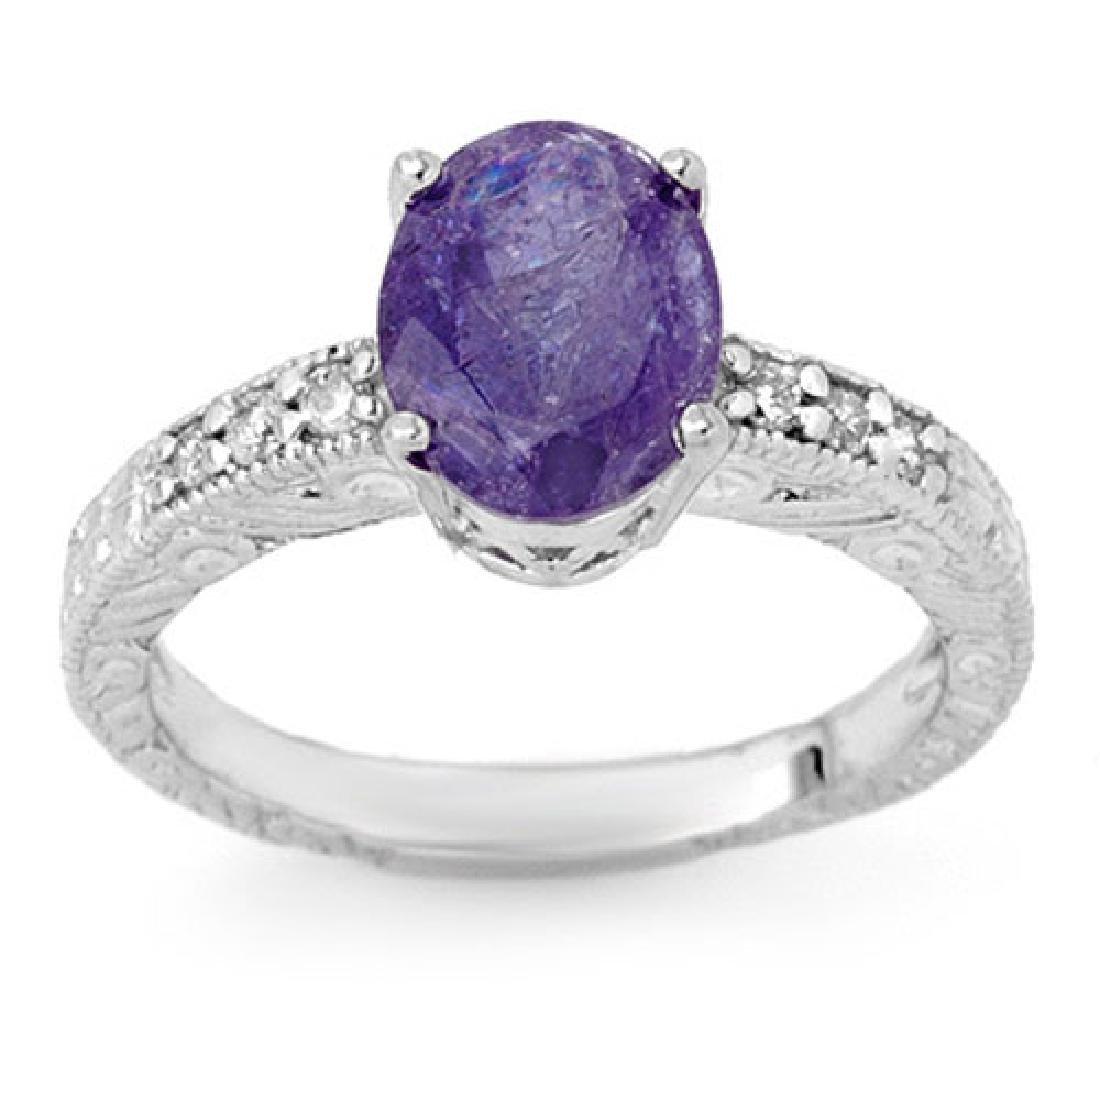 2.68 CTW Tanzanite & Diamond Ring 14K White Gold